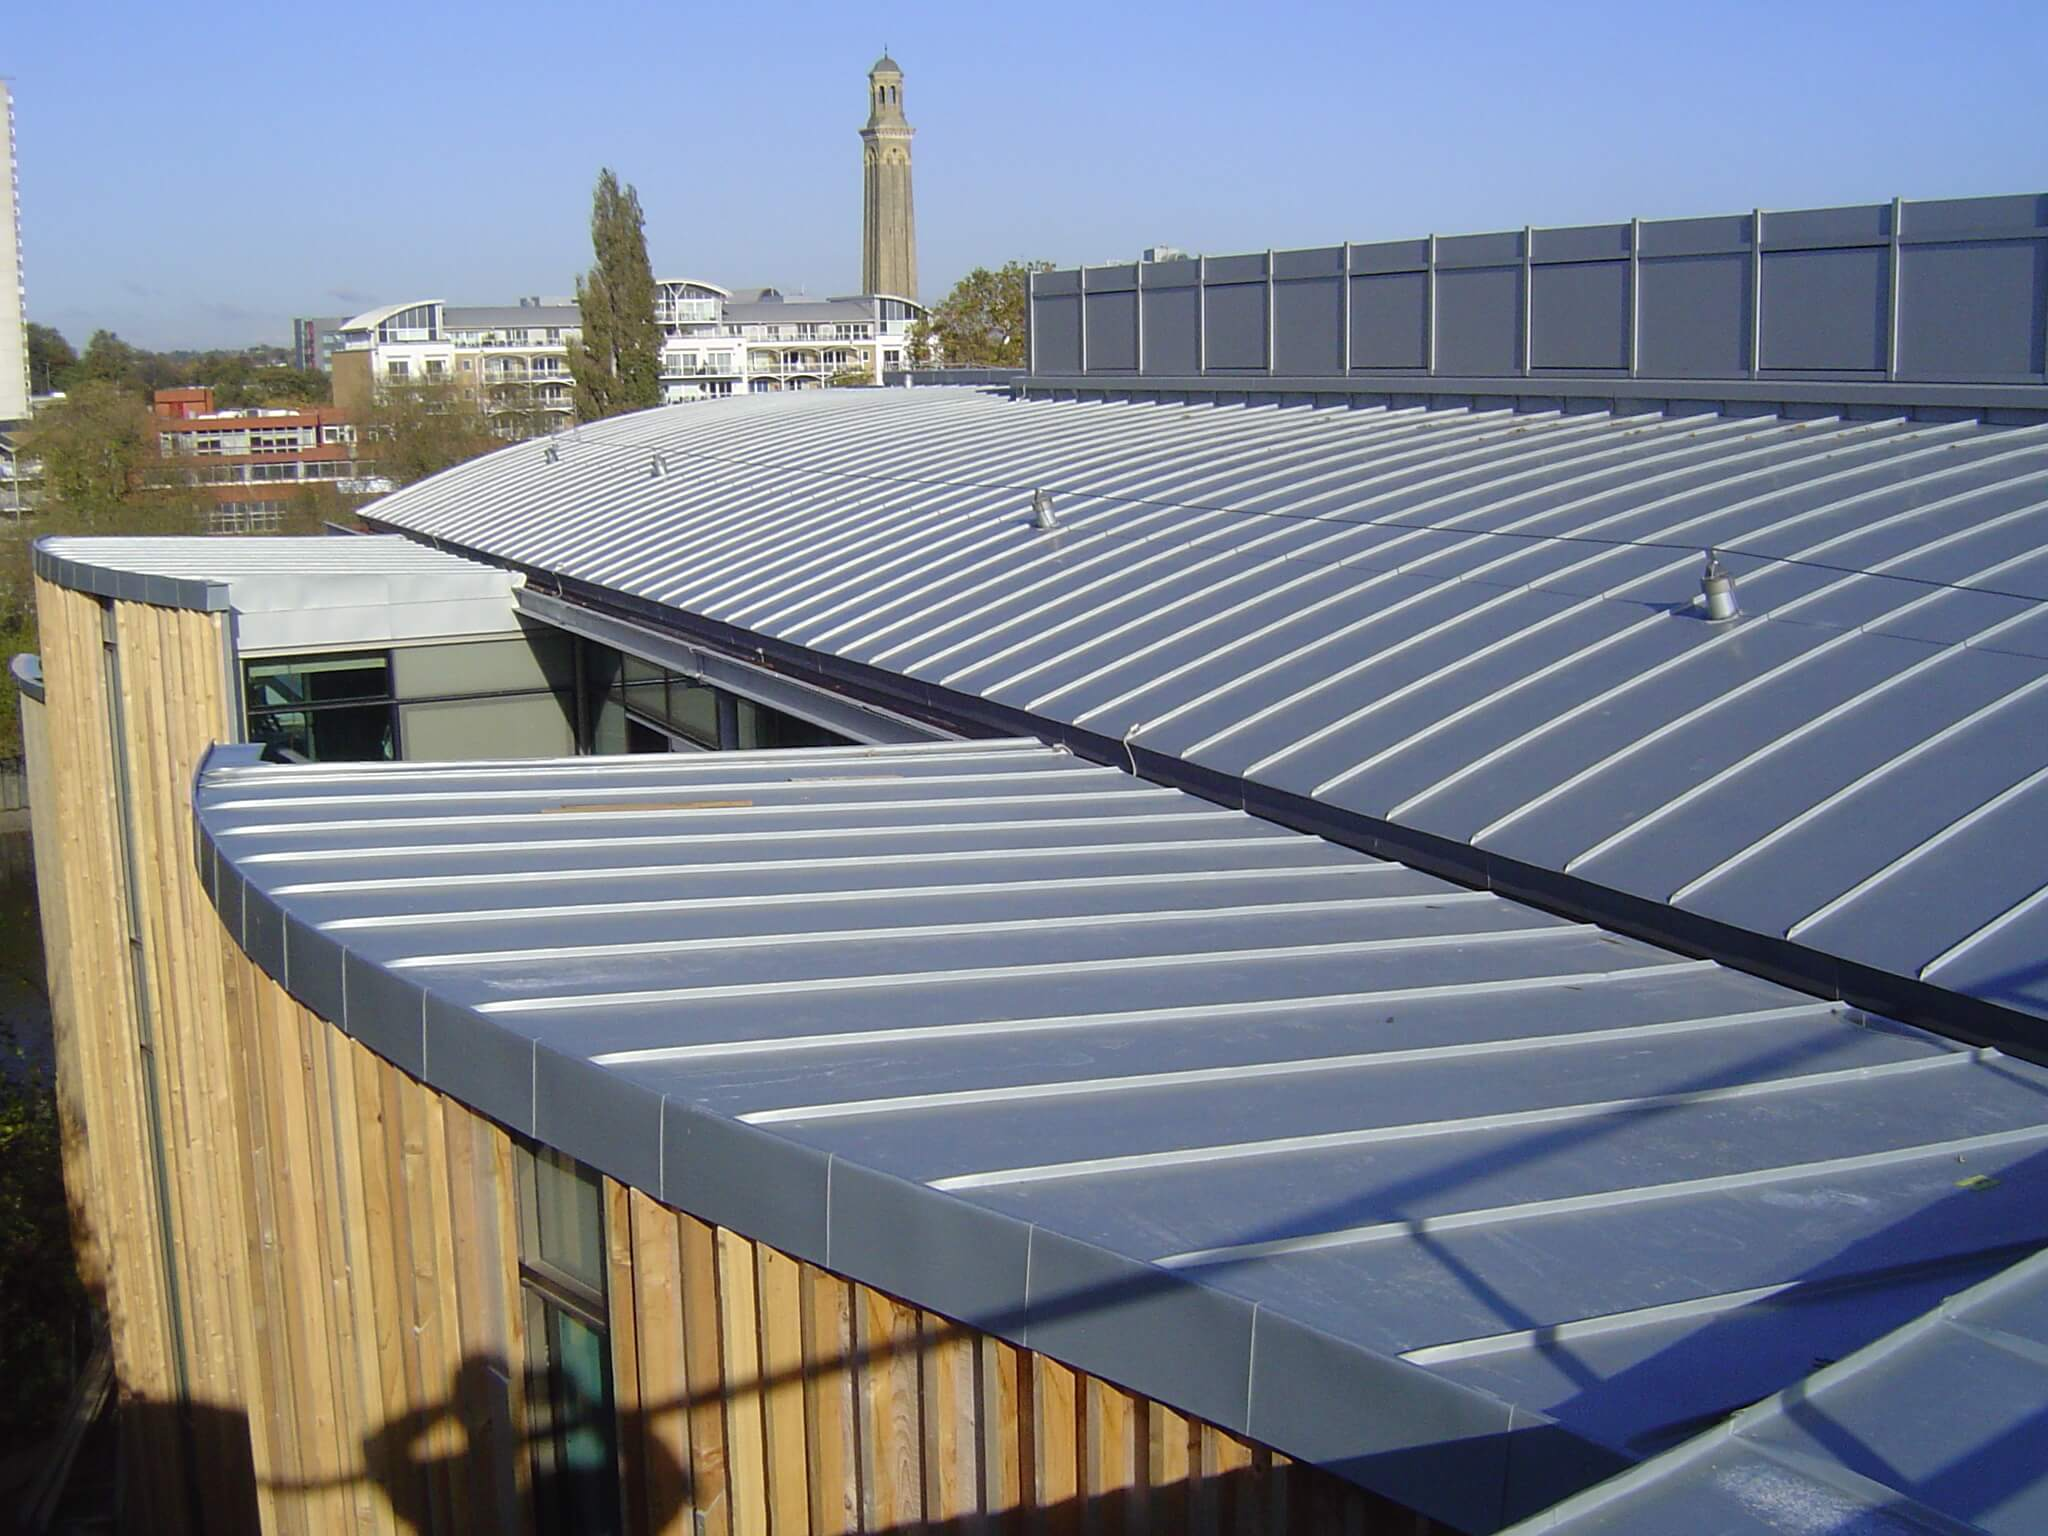 Roof after Nico roofing contractors work